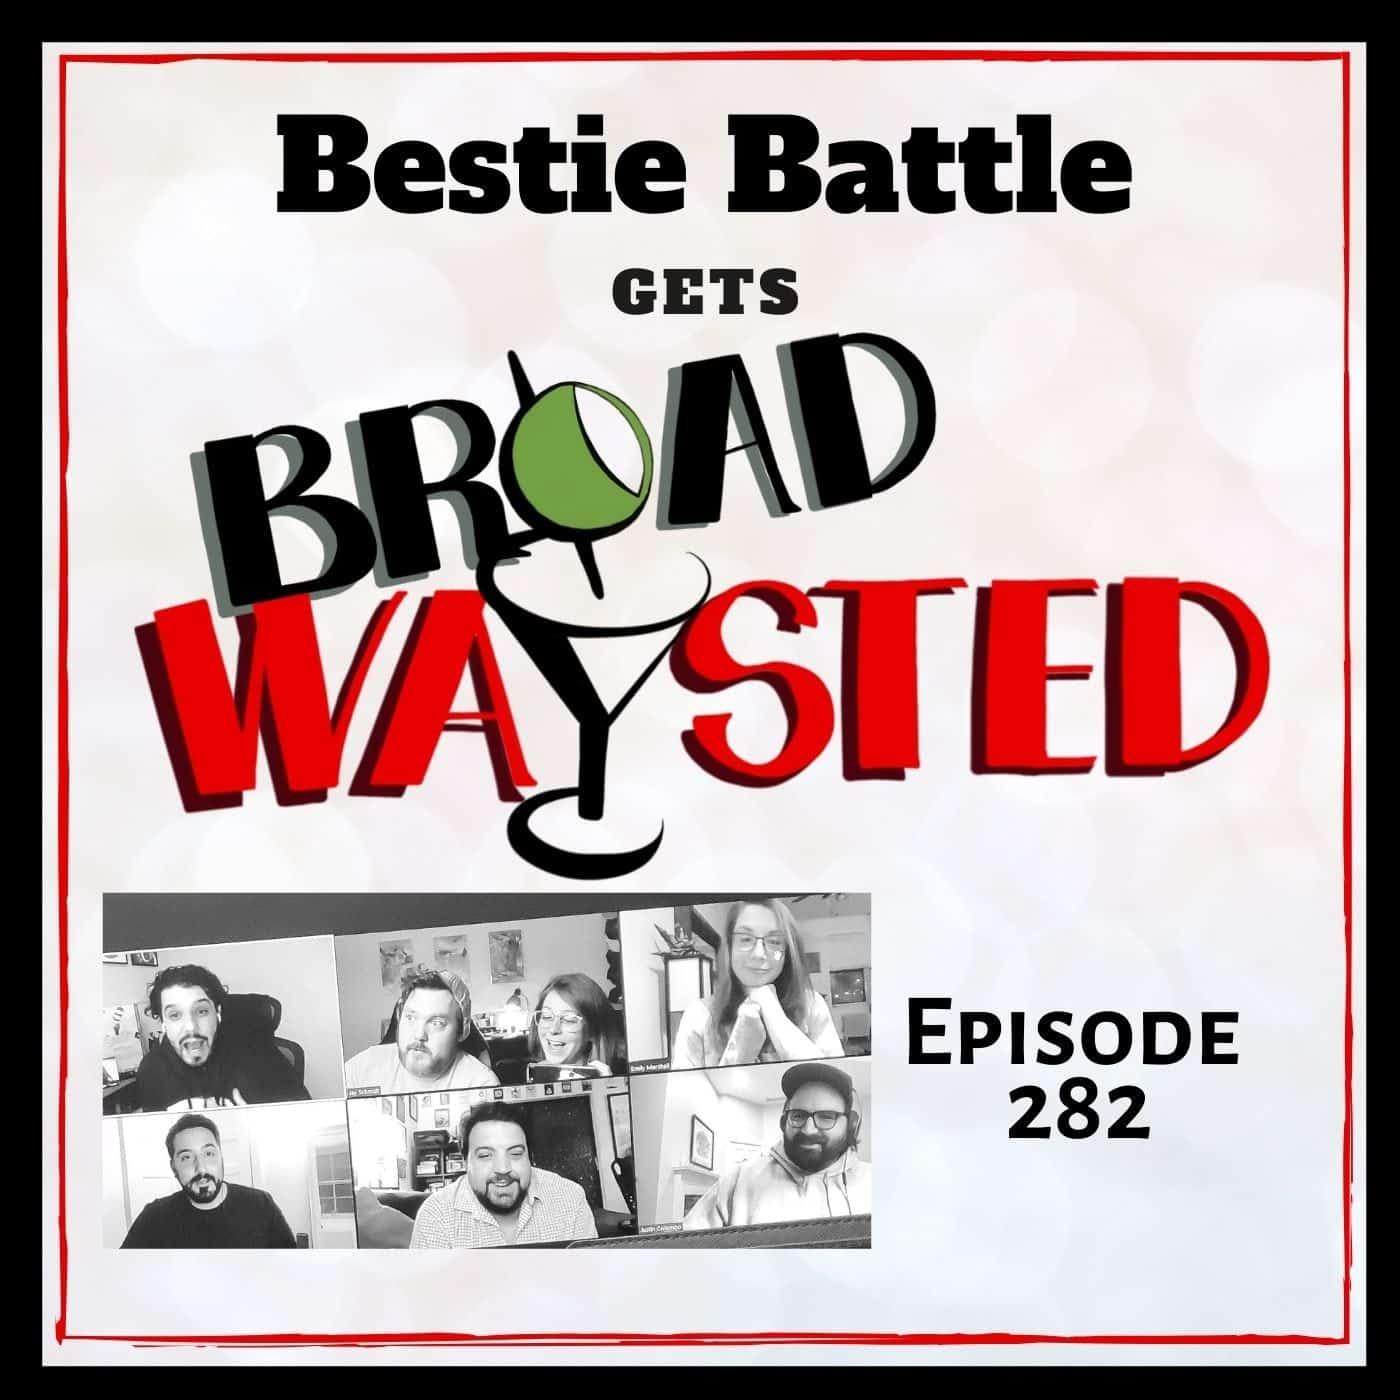 Episode 282: Bestie Battle gets Broadwaysted, Part 1!